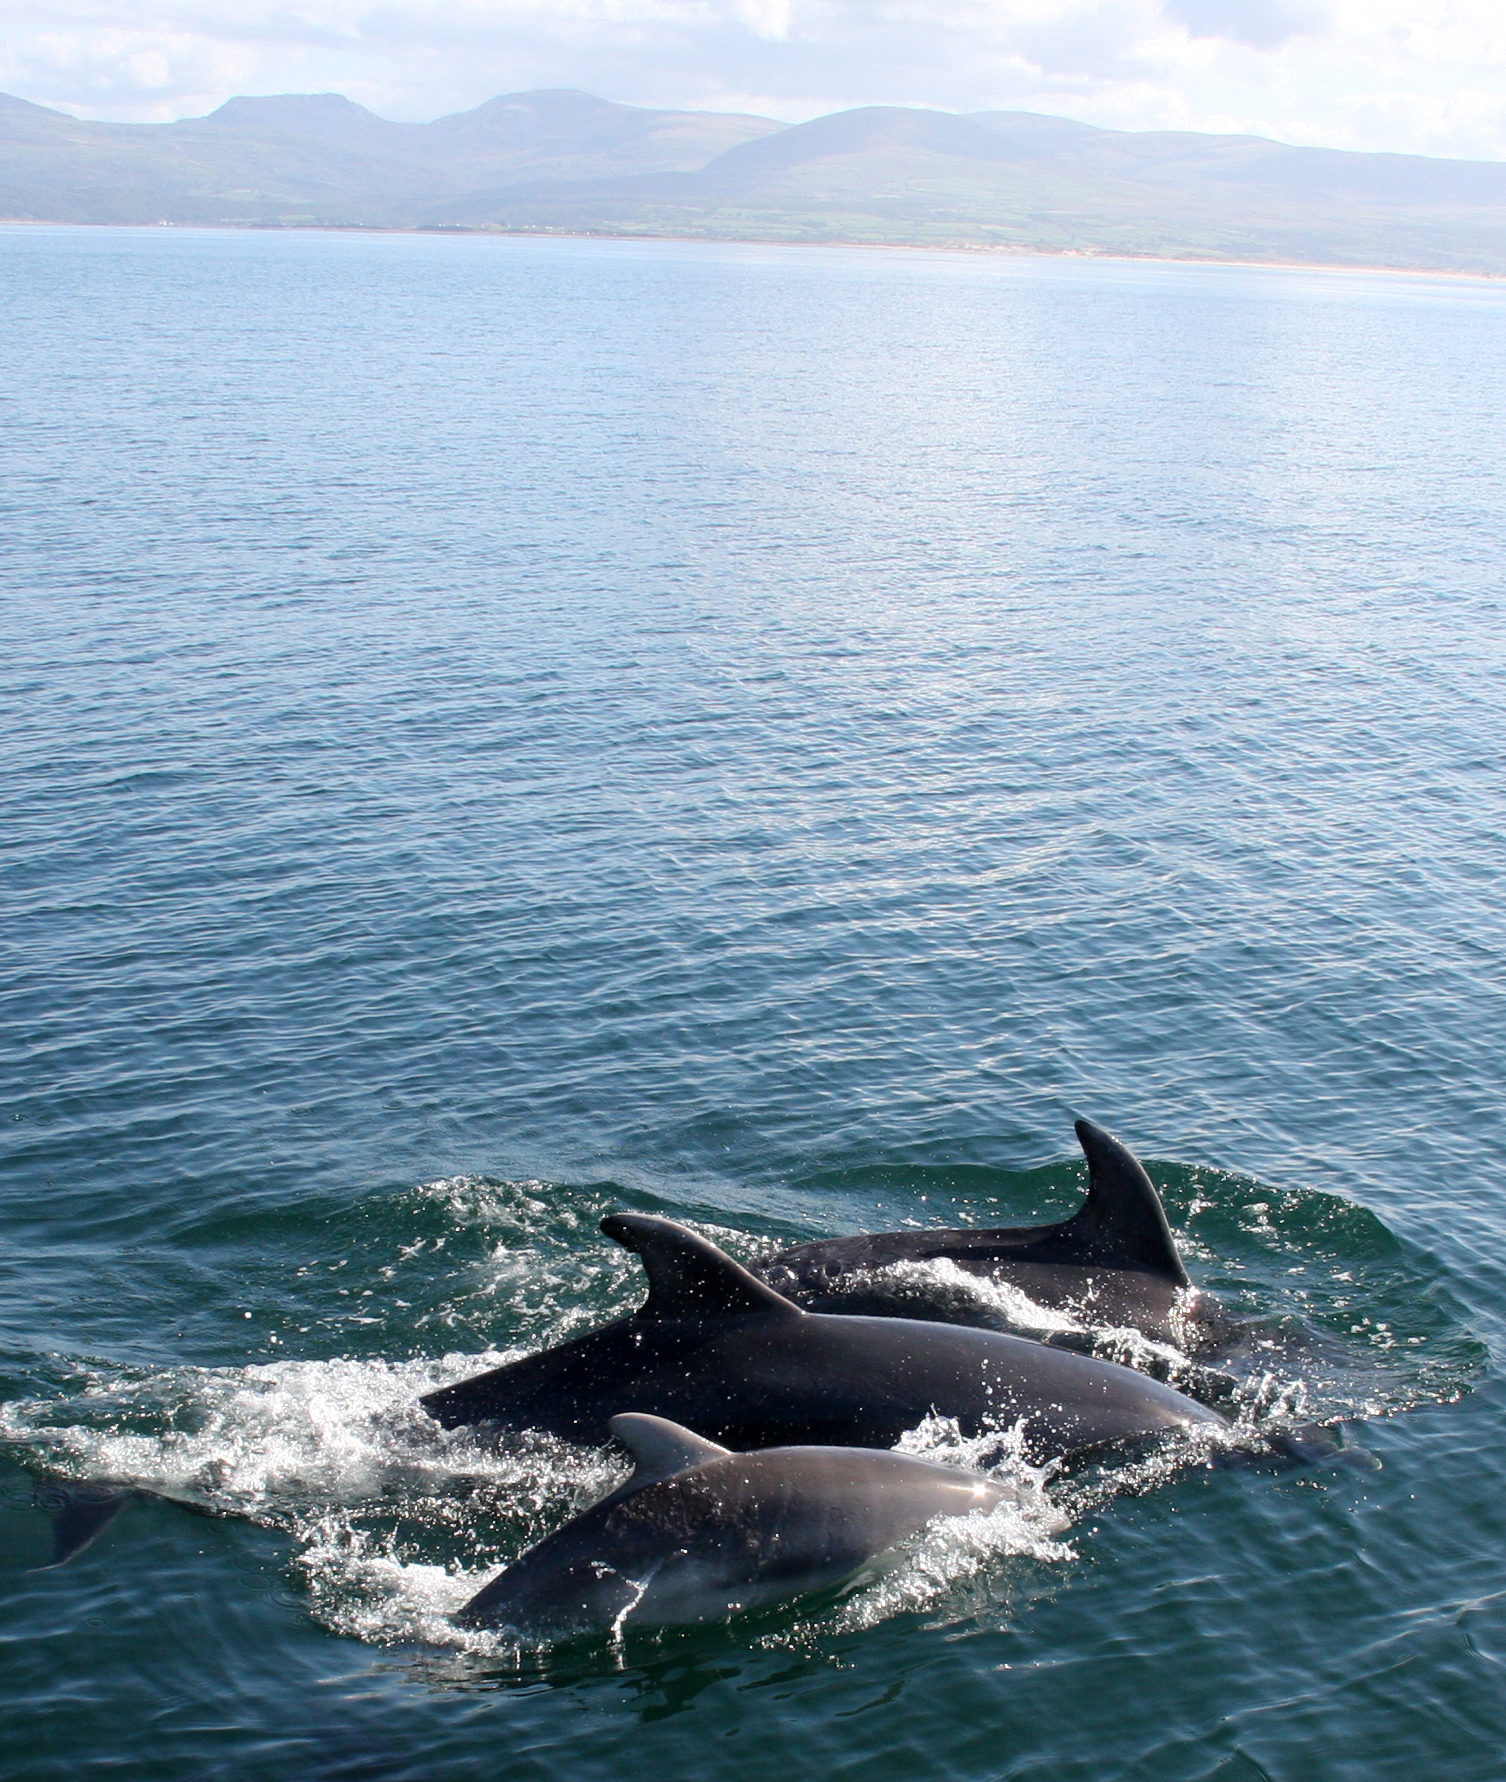 Abundance and Distribution of Coastal Bottlenose Dolphins